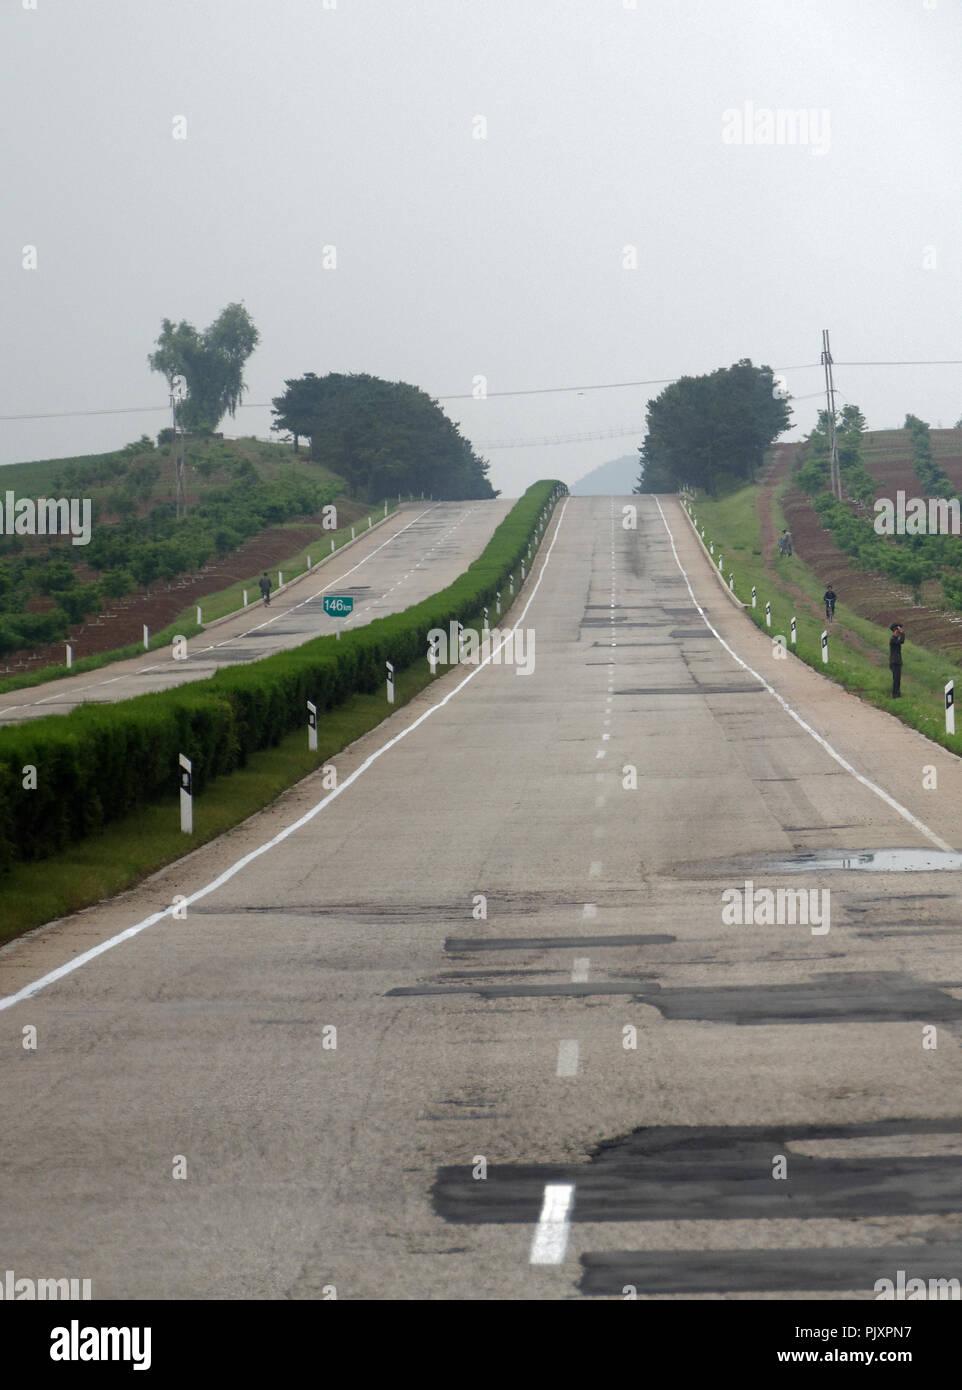 The empty Reunification highway outside Pyongyang, North Korea - Stock Image